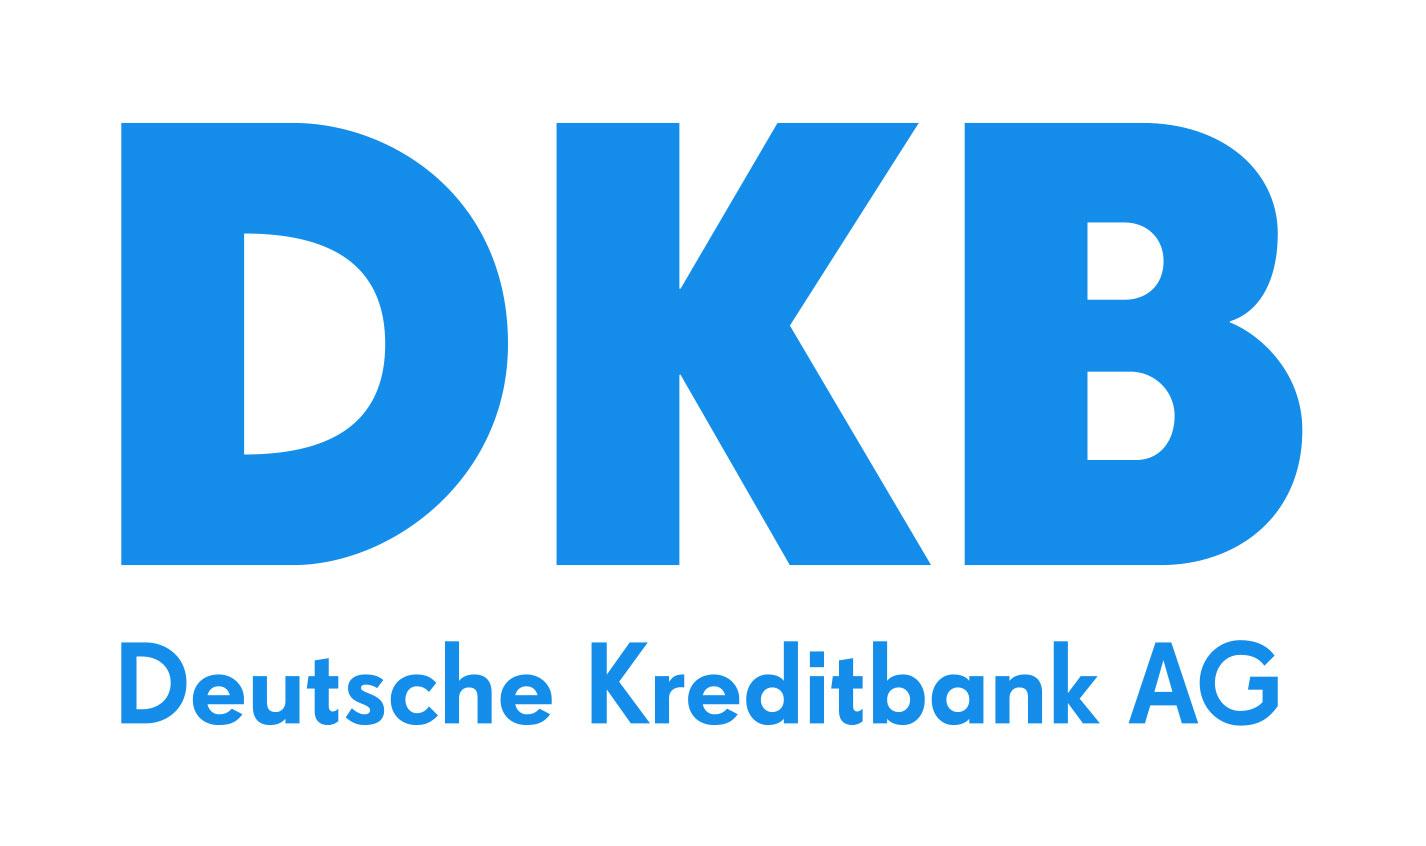 [DKB.de/Shoop] 25 Euro Cashback bei Kontoeröffnung (inkl. Kreditkarte)